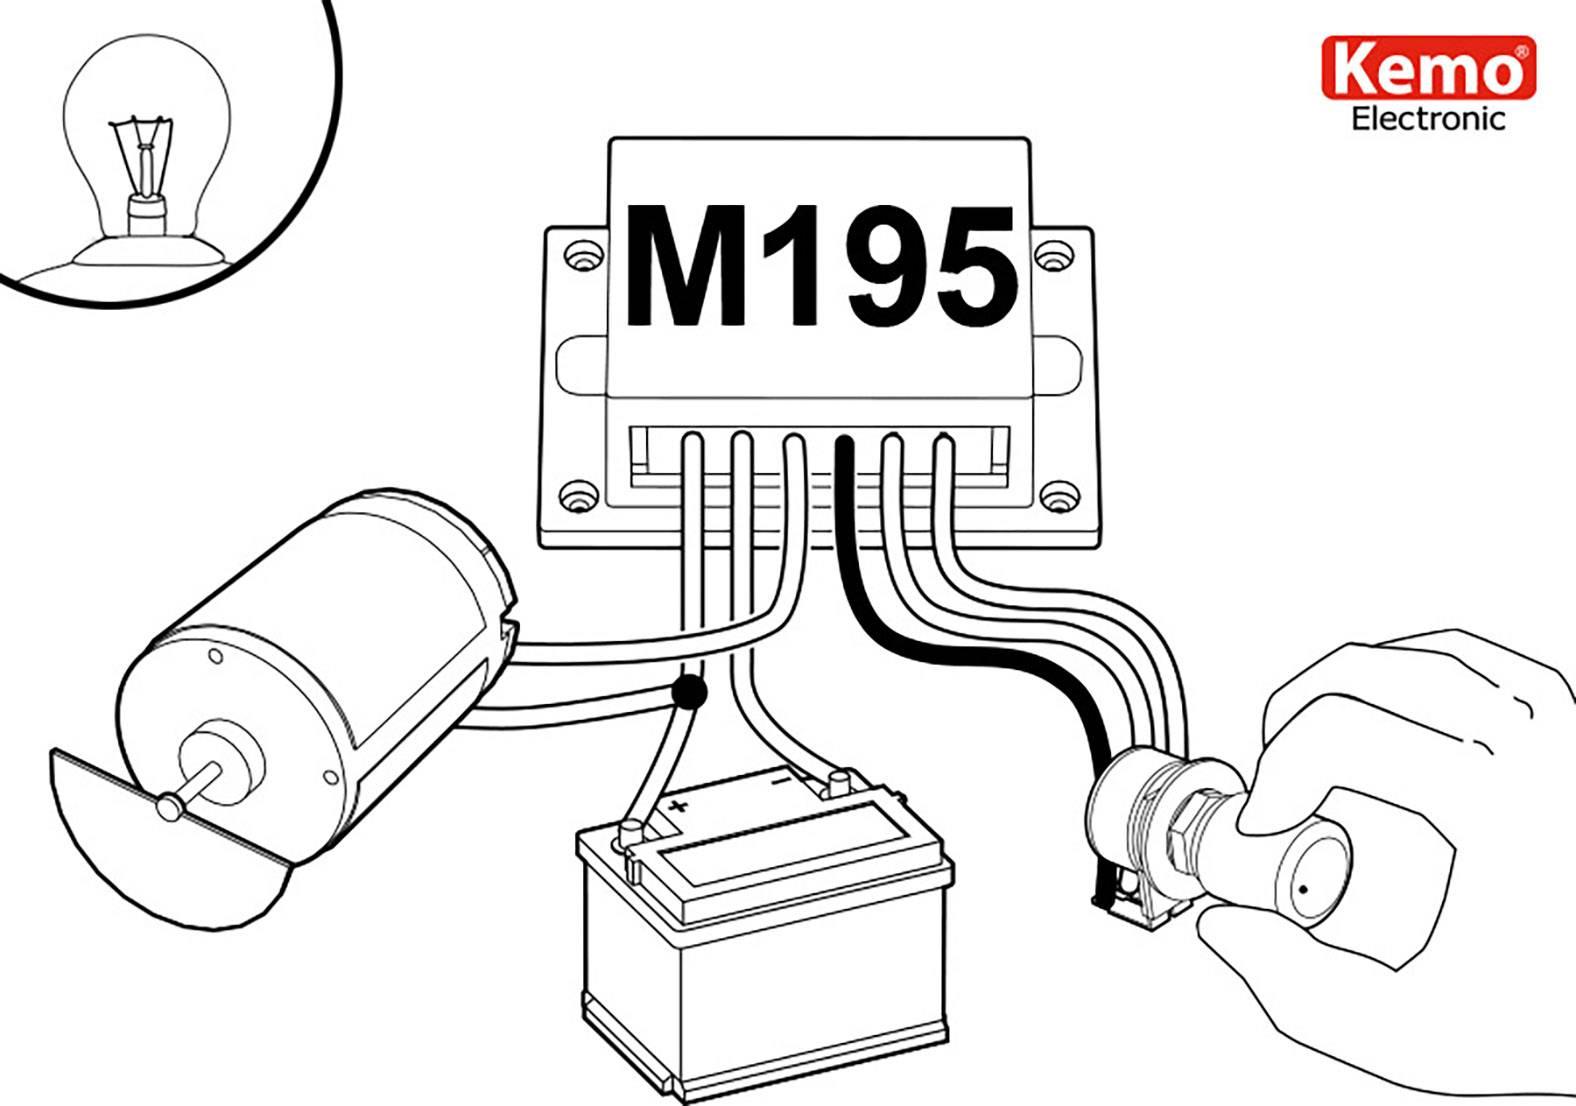 baustein c auto electrical wiring diagramkemo pwm leistungsregler baustein m195 9 v dc 12 v dc 24